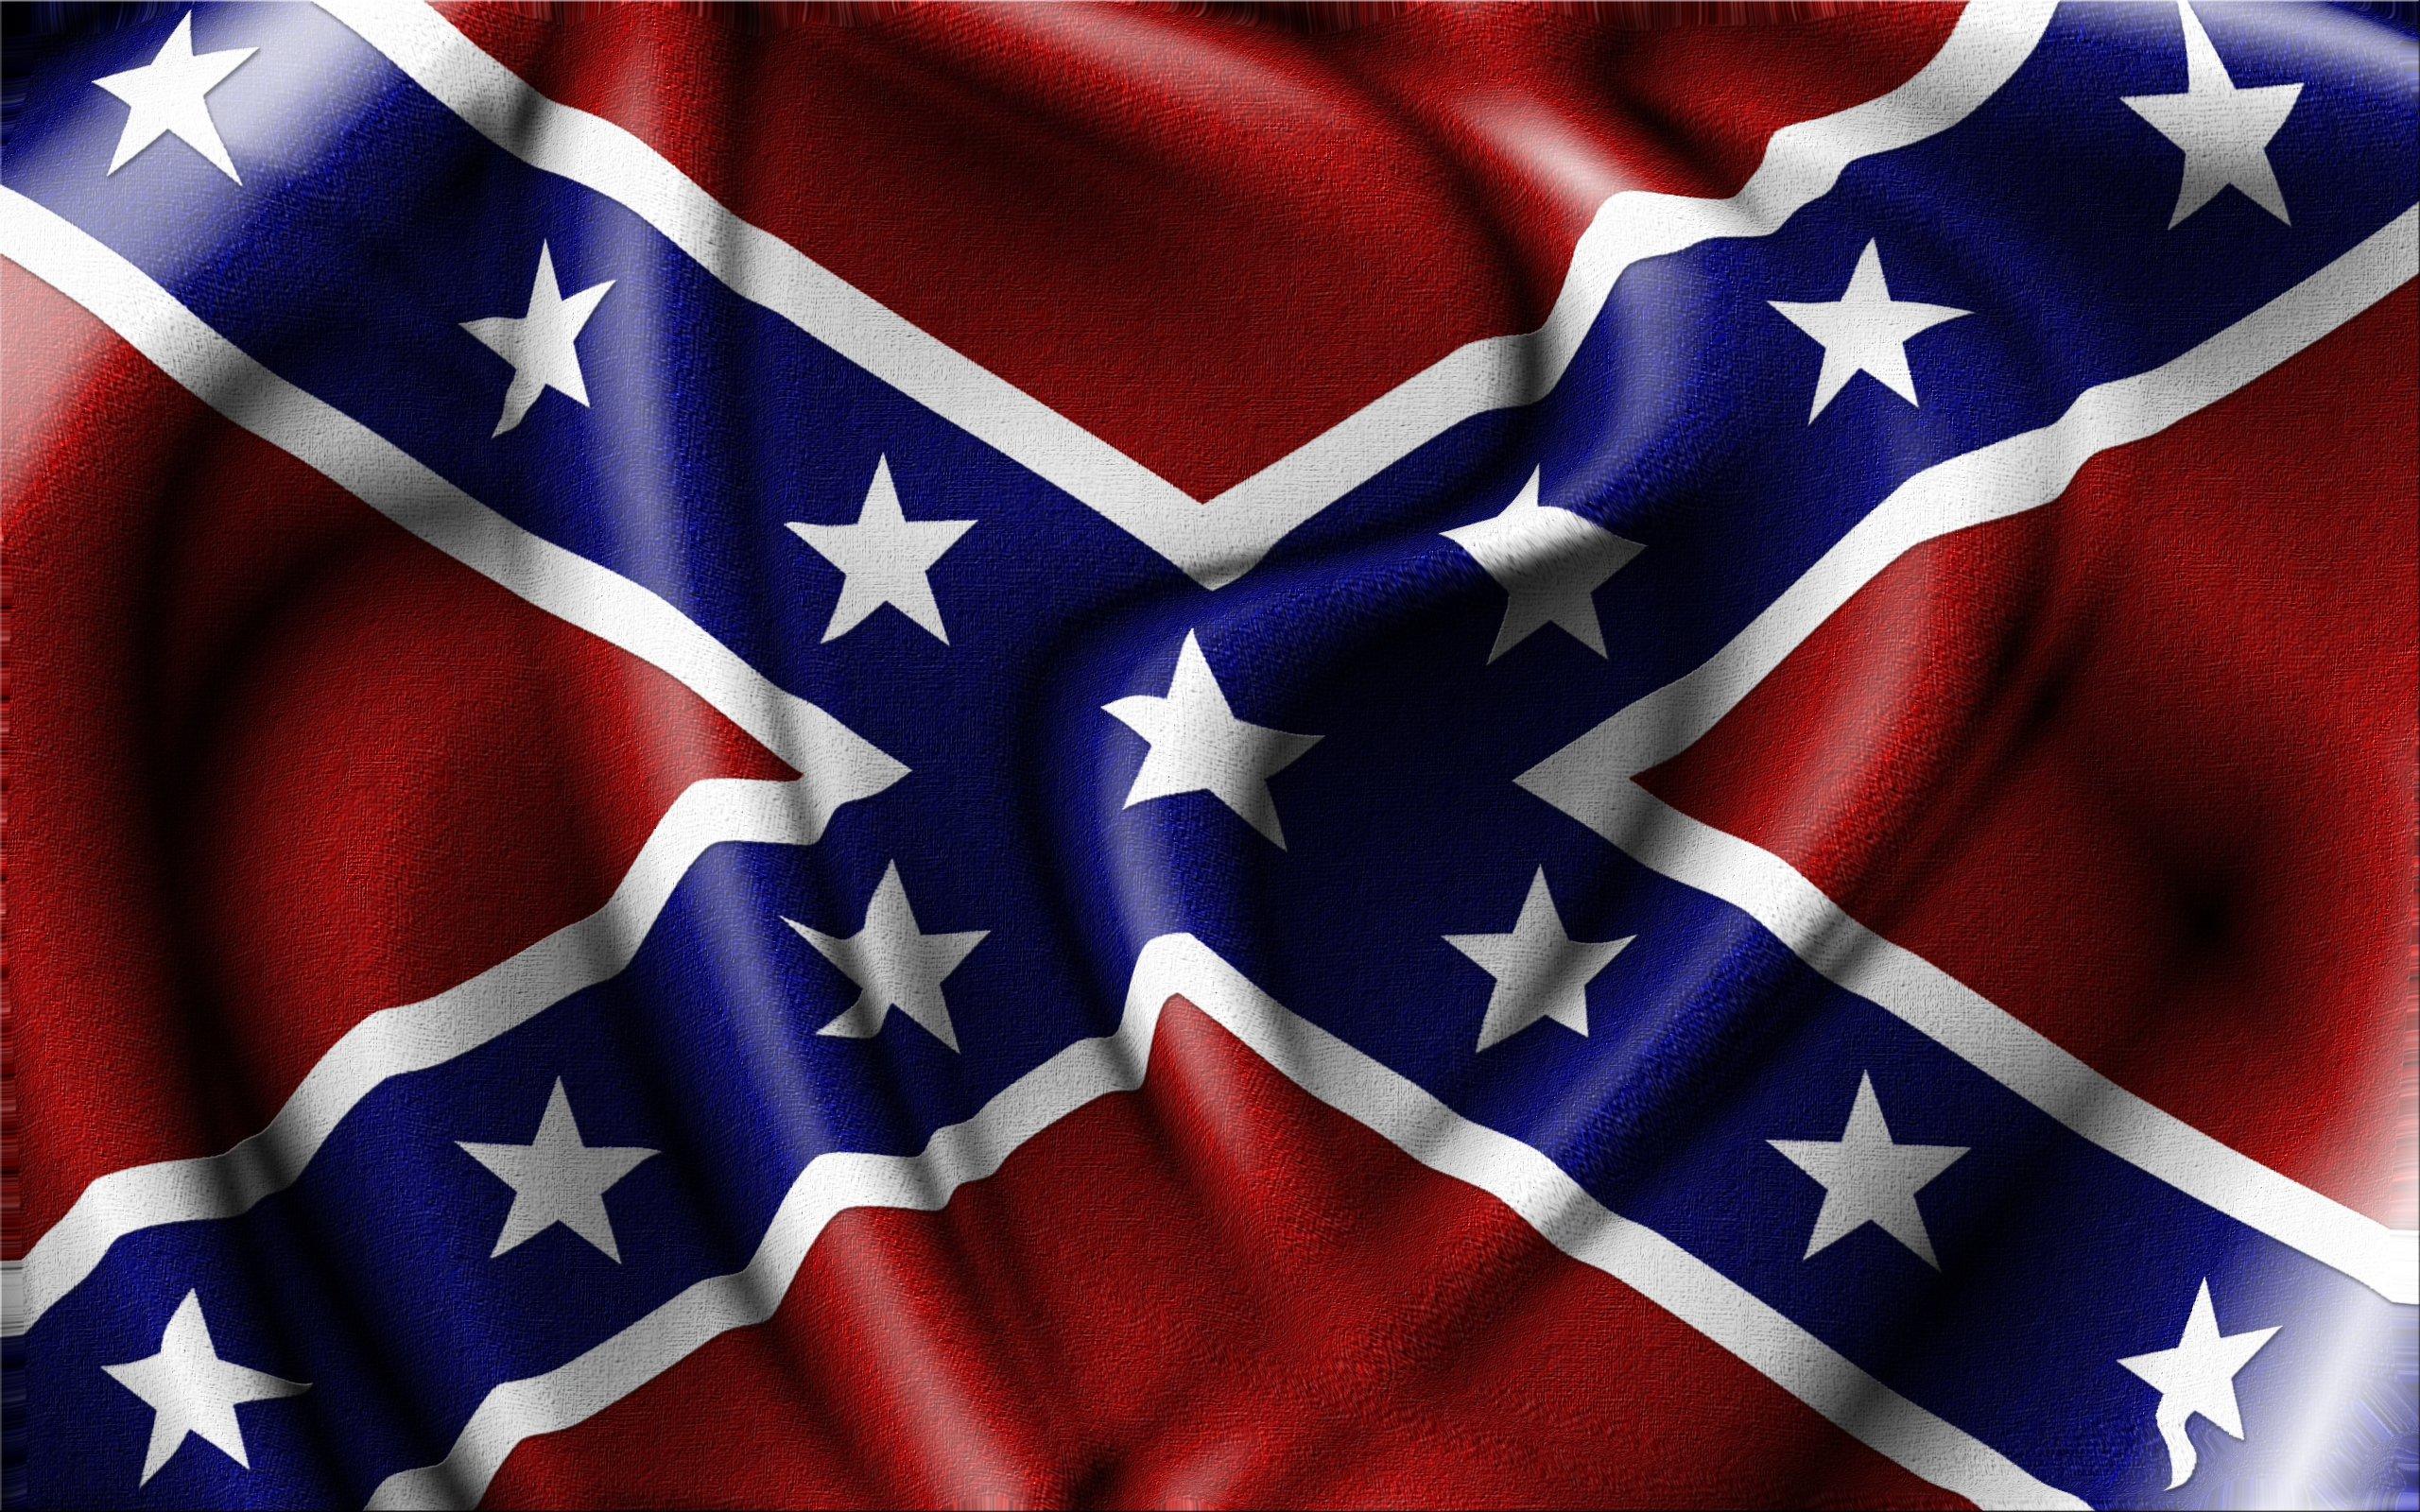 CONFEDERATE flag usa america united states csa civil war rebel dixie military poster wallpaper | 2560x1600 | 742440 | WallpaperUP